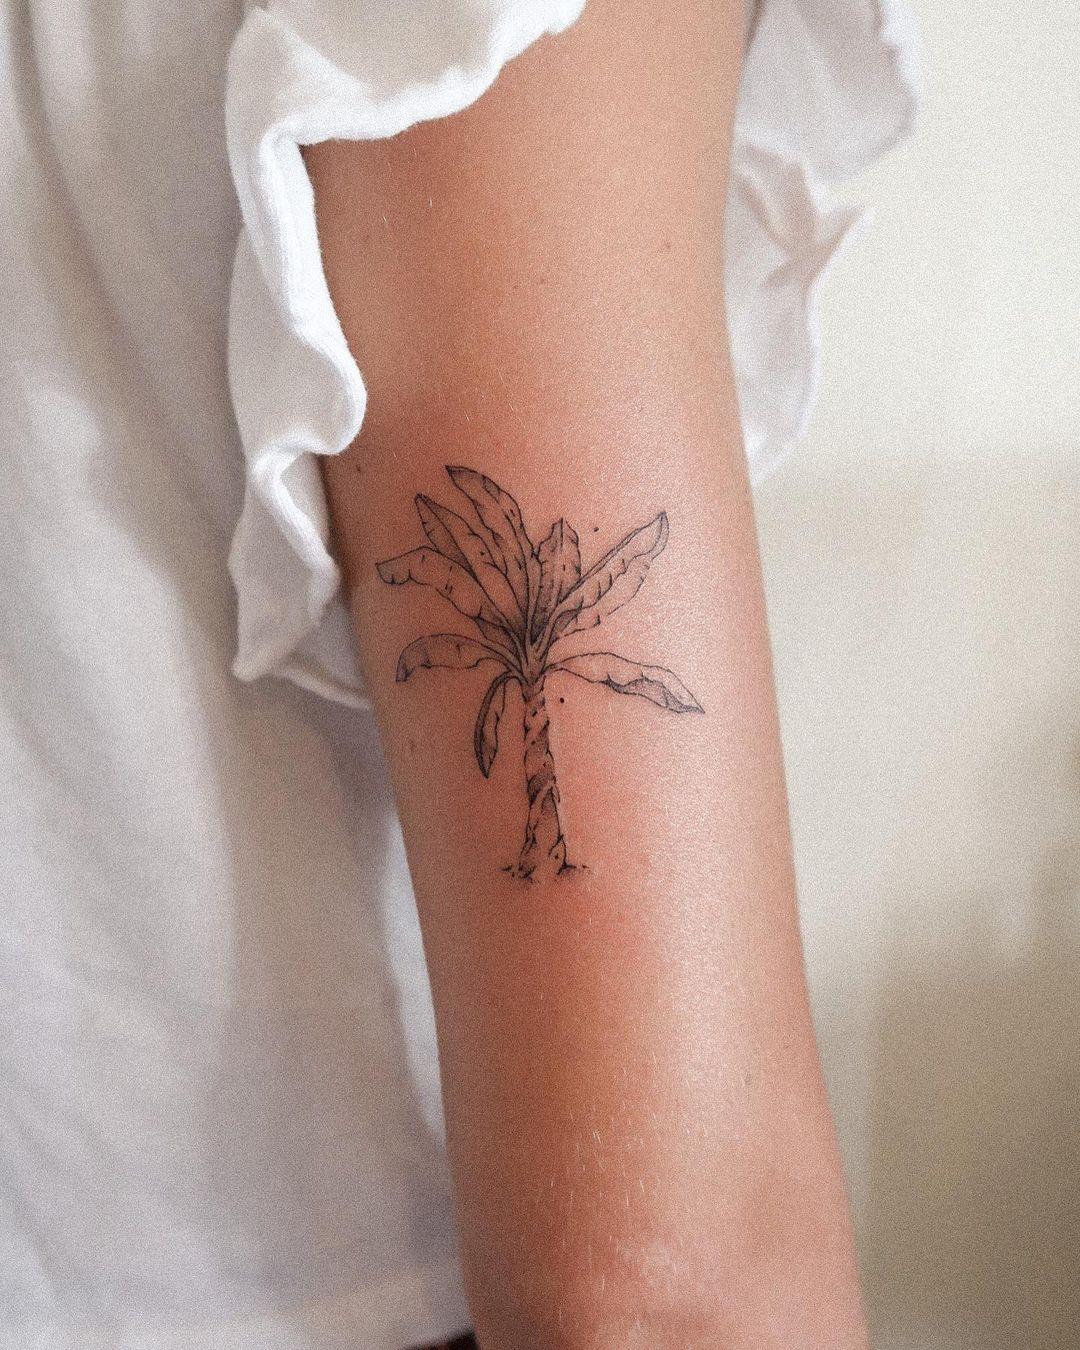 Soni GRoss - Renato tatuajes guest tattooer 7